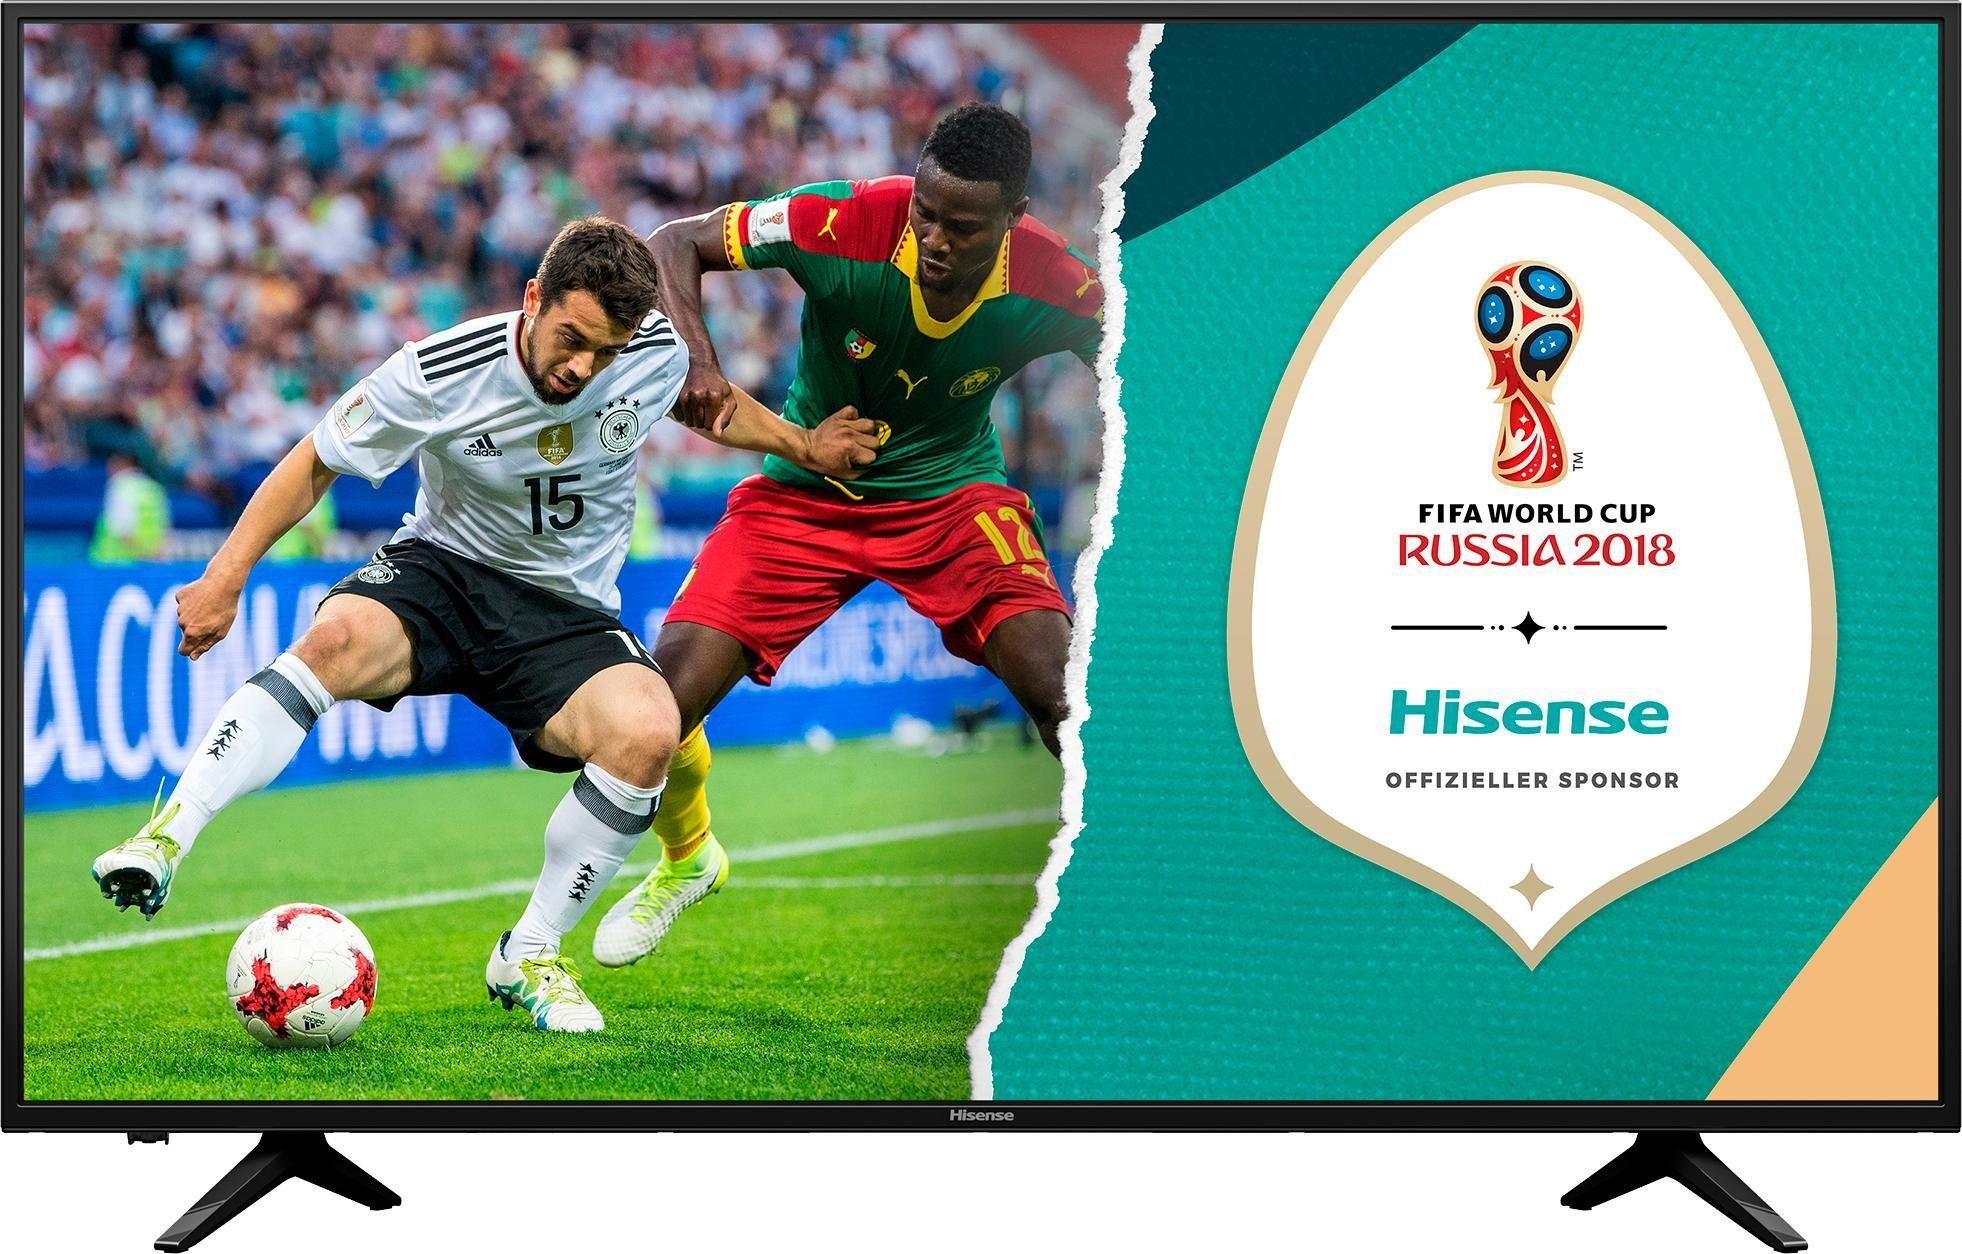 Hisense H65AE6000 LED-Fernseher (65 Zoll, 4K Ultra HD, Smart-TV)